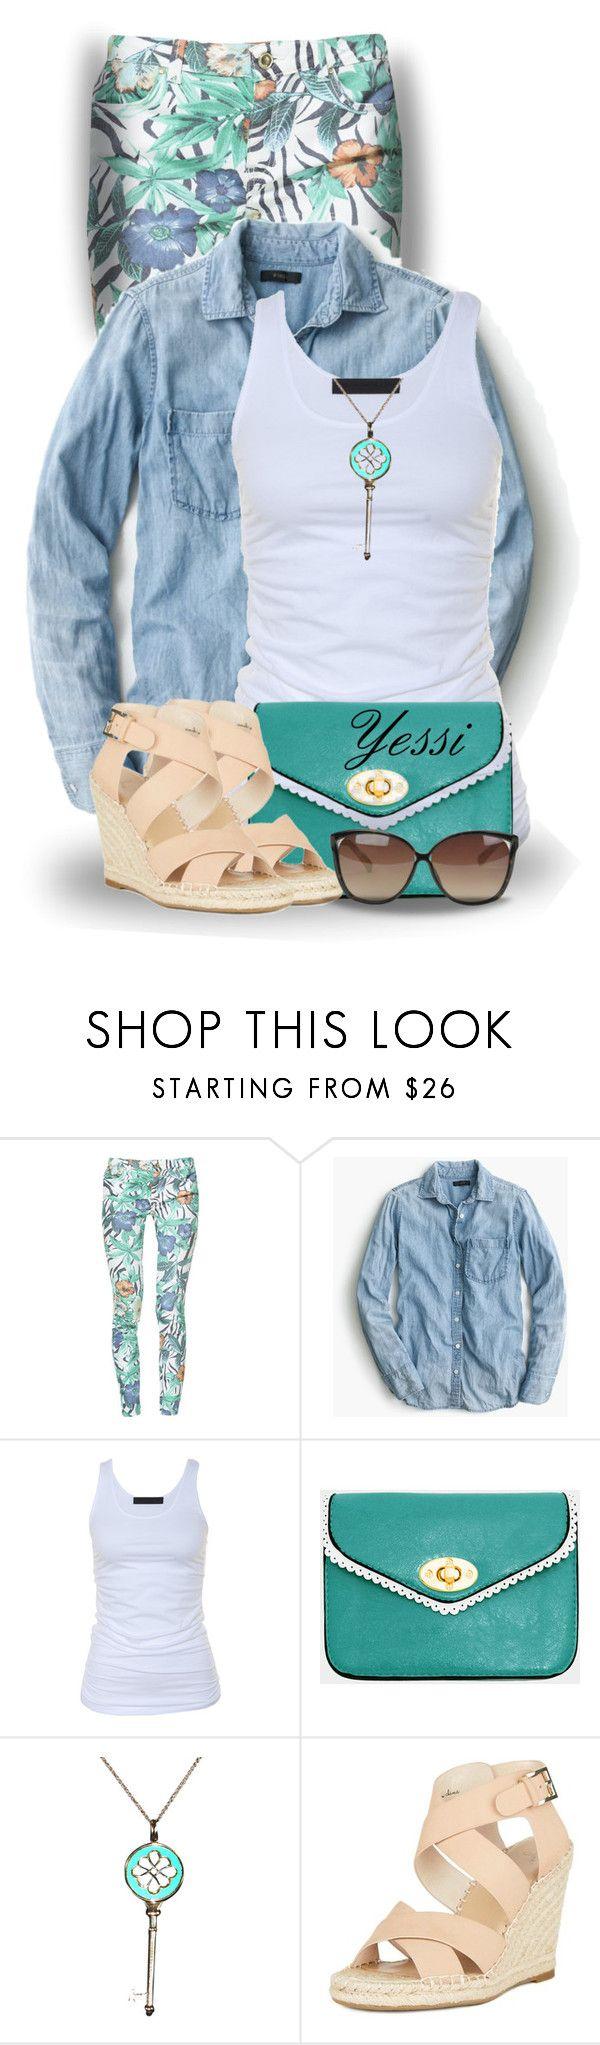 """~ 💕 TEAL Purse, Bag or Tote💕 ~"" by pretty-fashion-designs ❤ liked on Polyvore featuring Zara, J.Crew, Tusnelda Bloch, Tiffany & Co. and Linda Farrow"